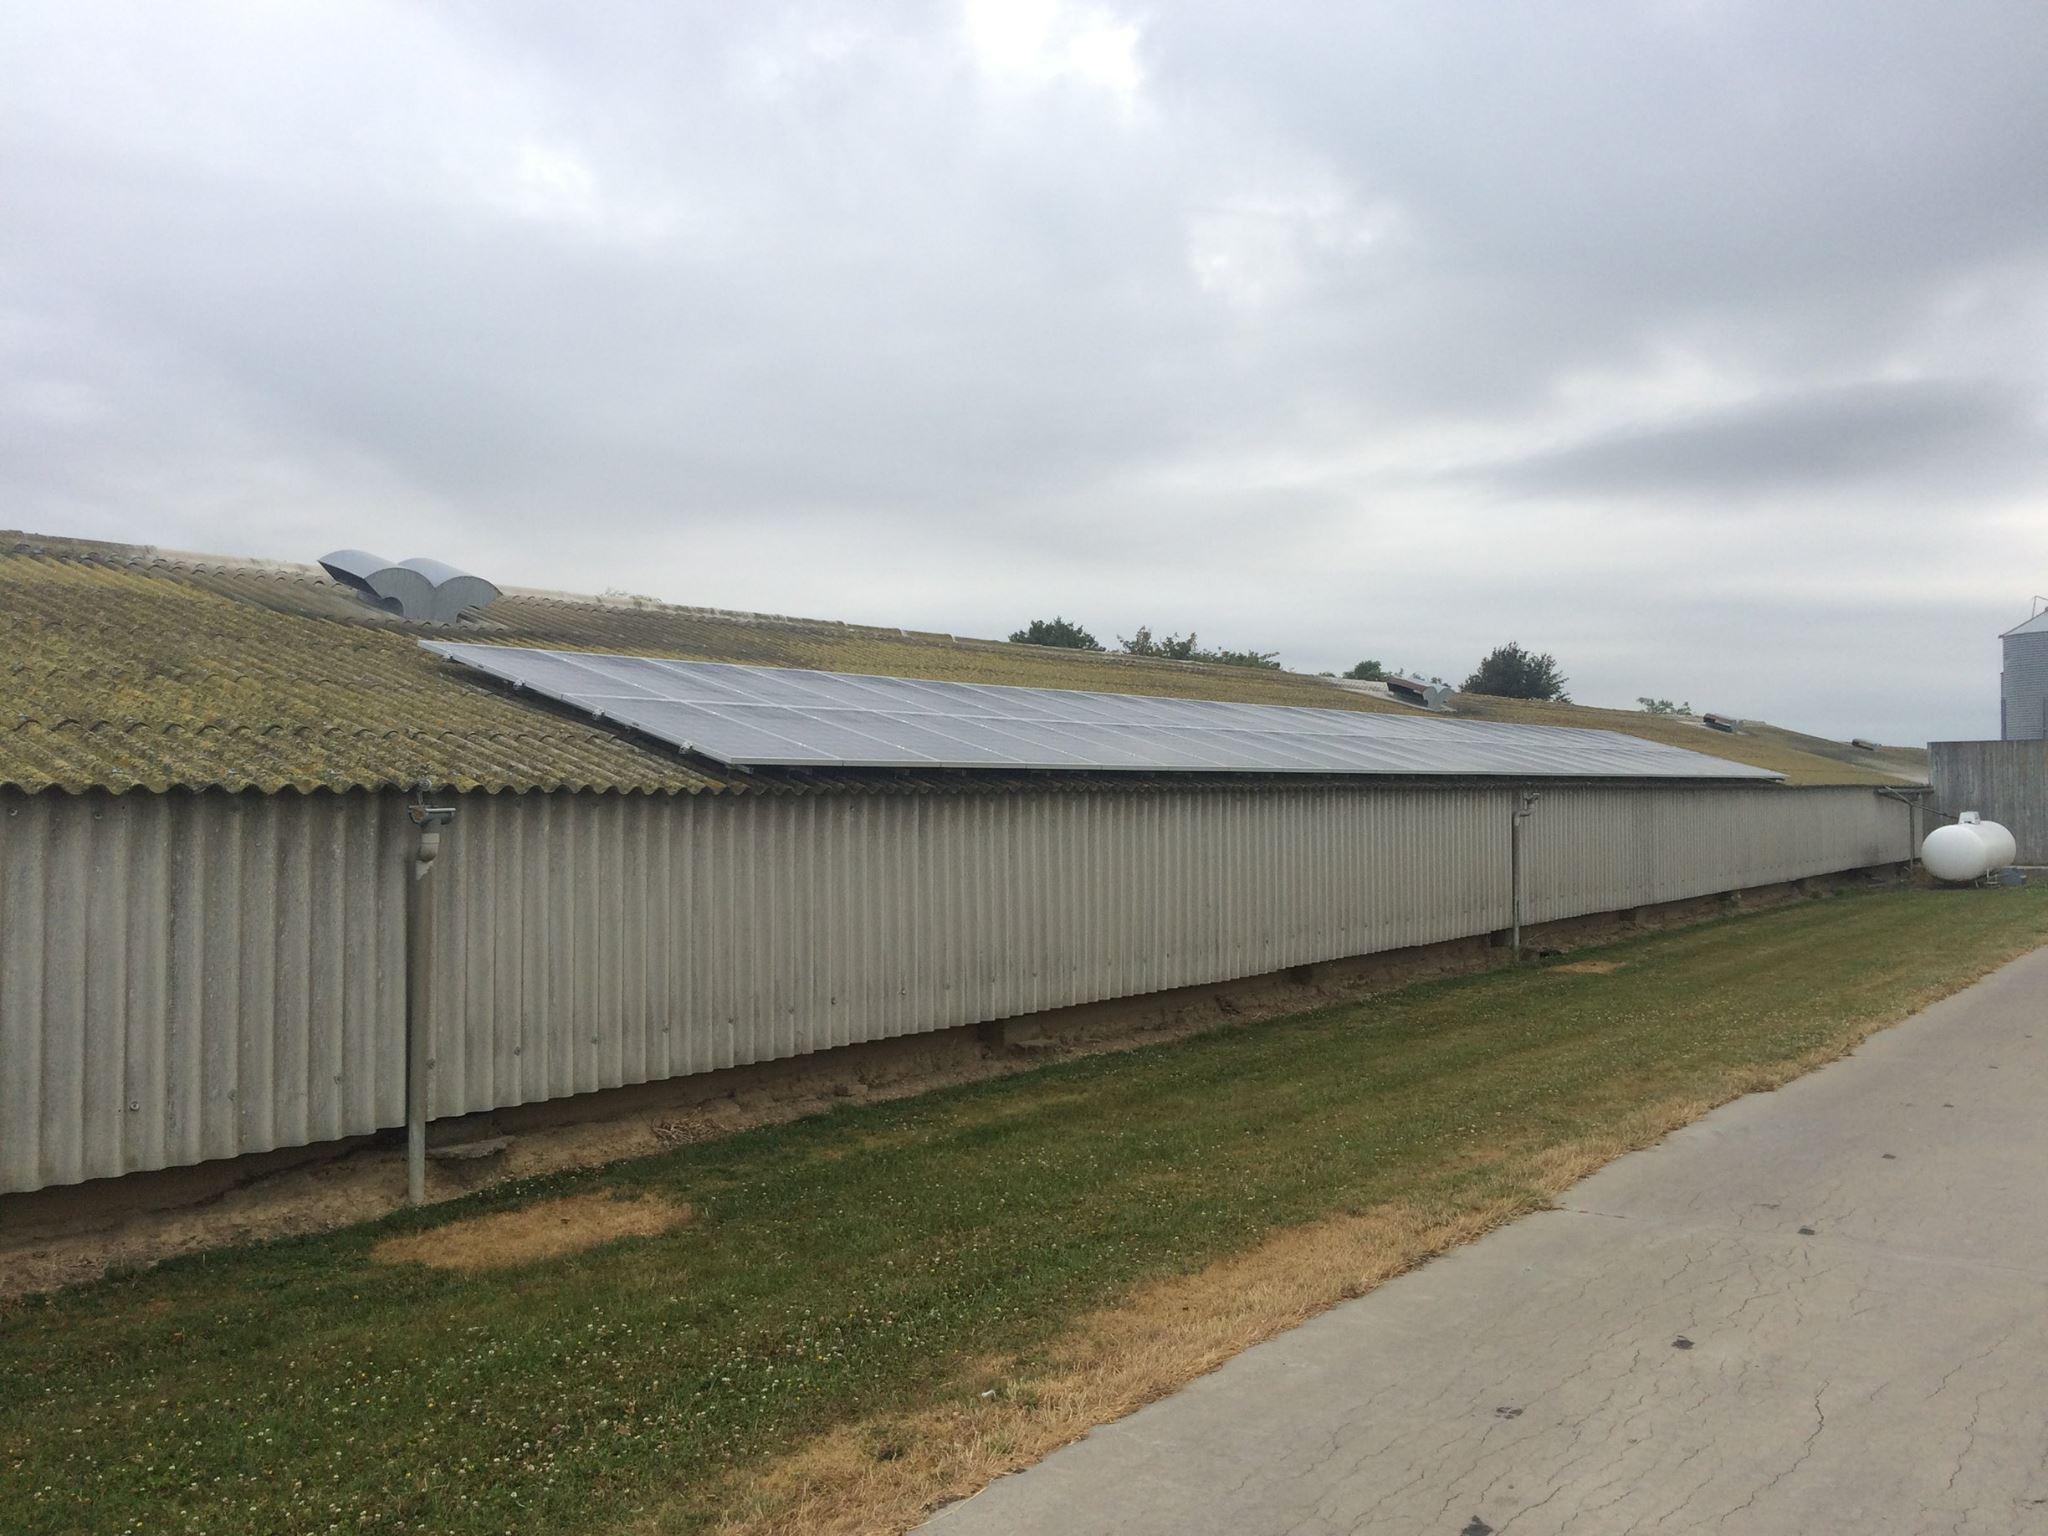 winnezeele photovoltaïque